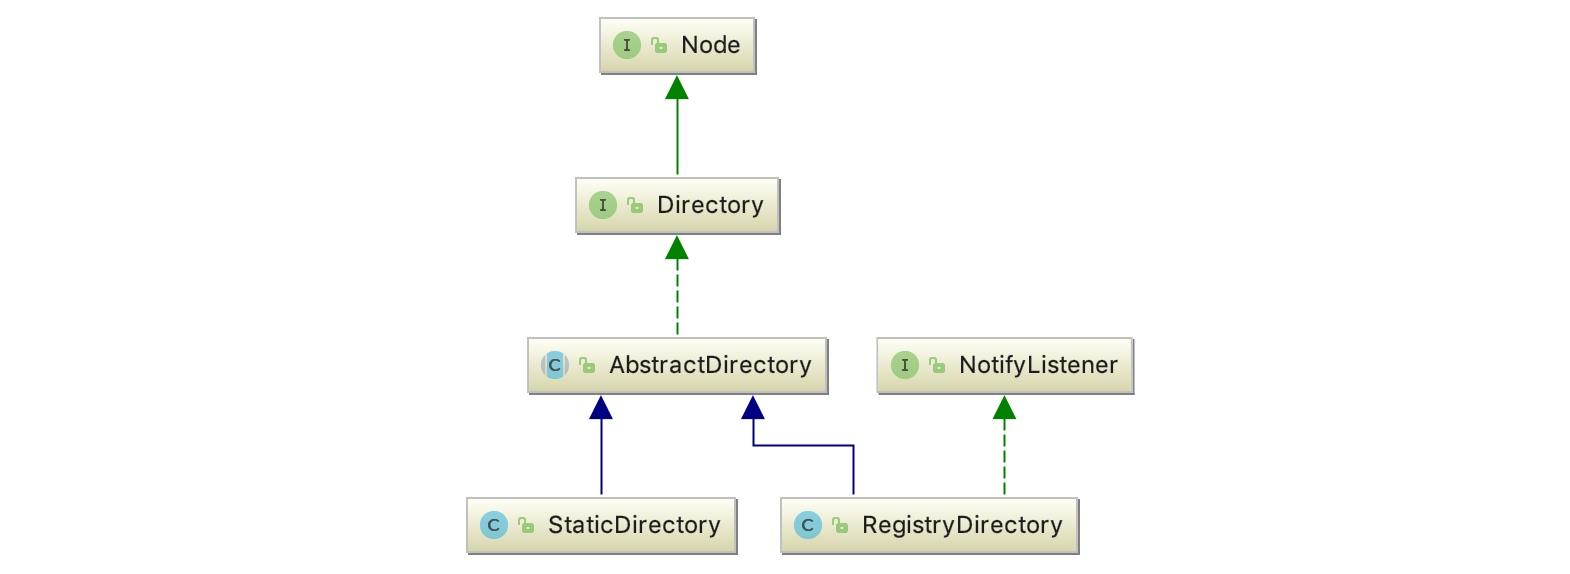 Dubbo 源码分析 - 集群容错之Directory